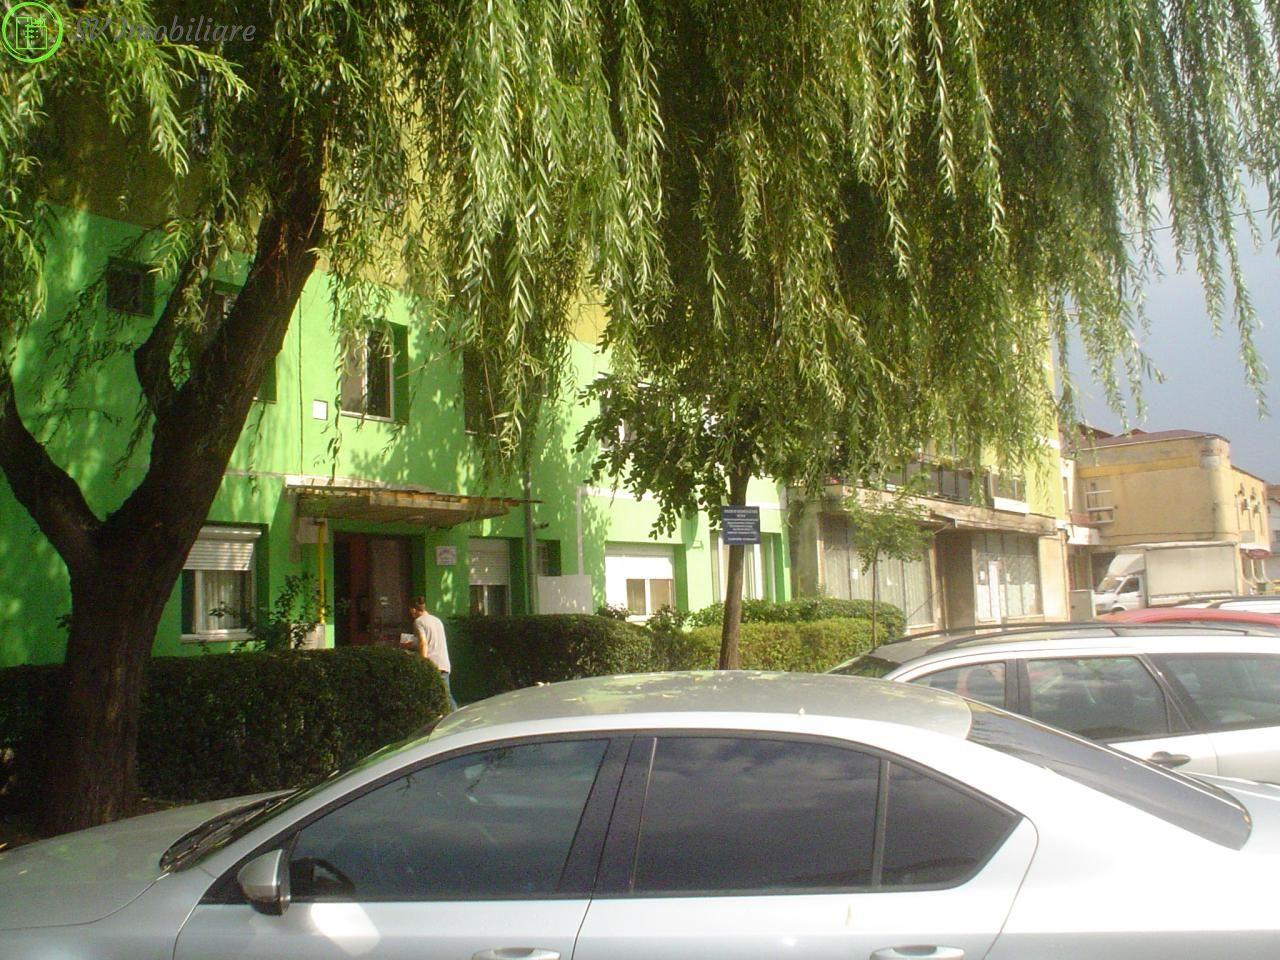 Apartament de vanzare, Caraș-Severin (judet), Caransebeş - Foto 2